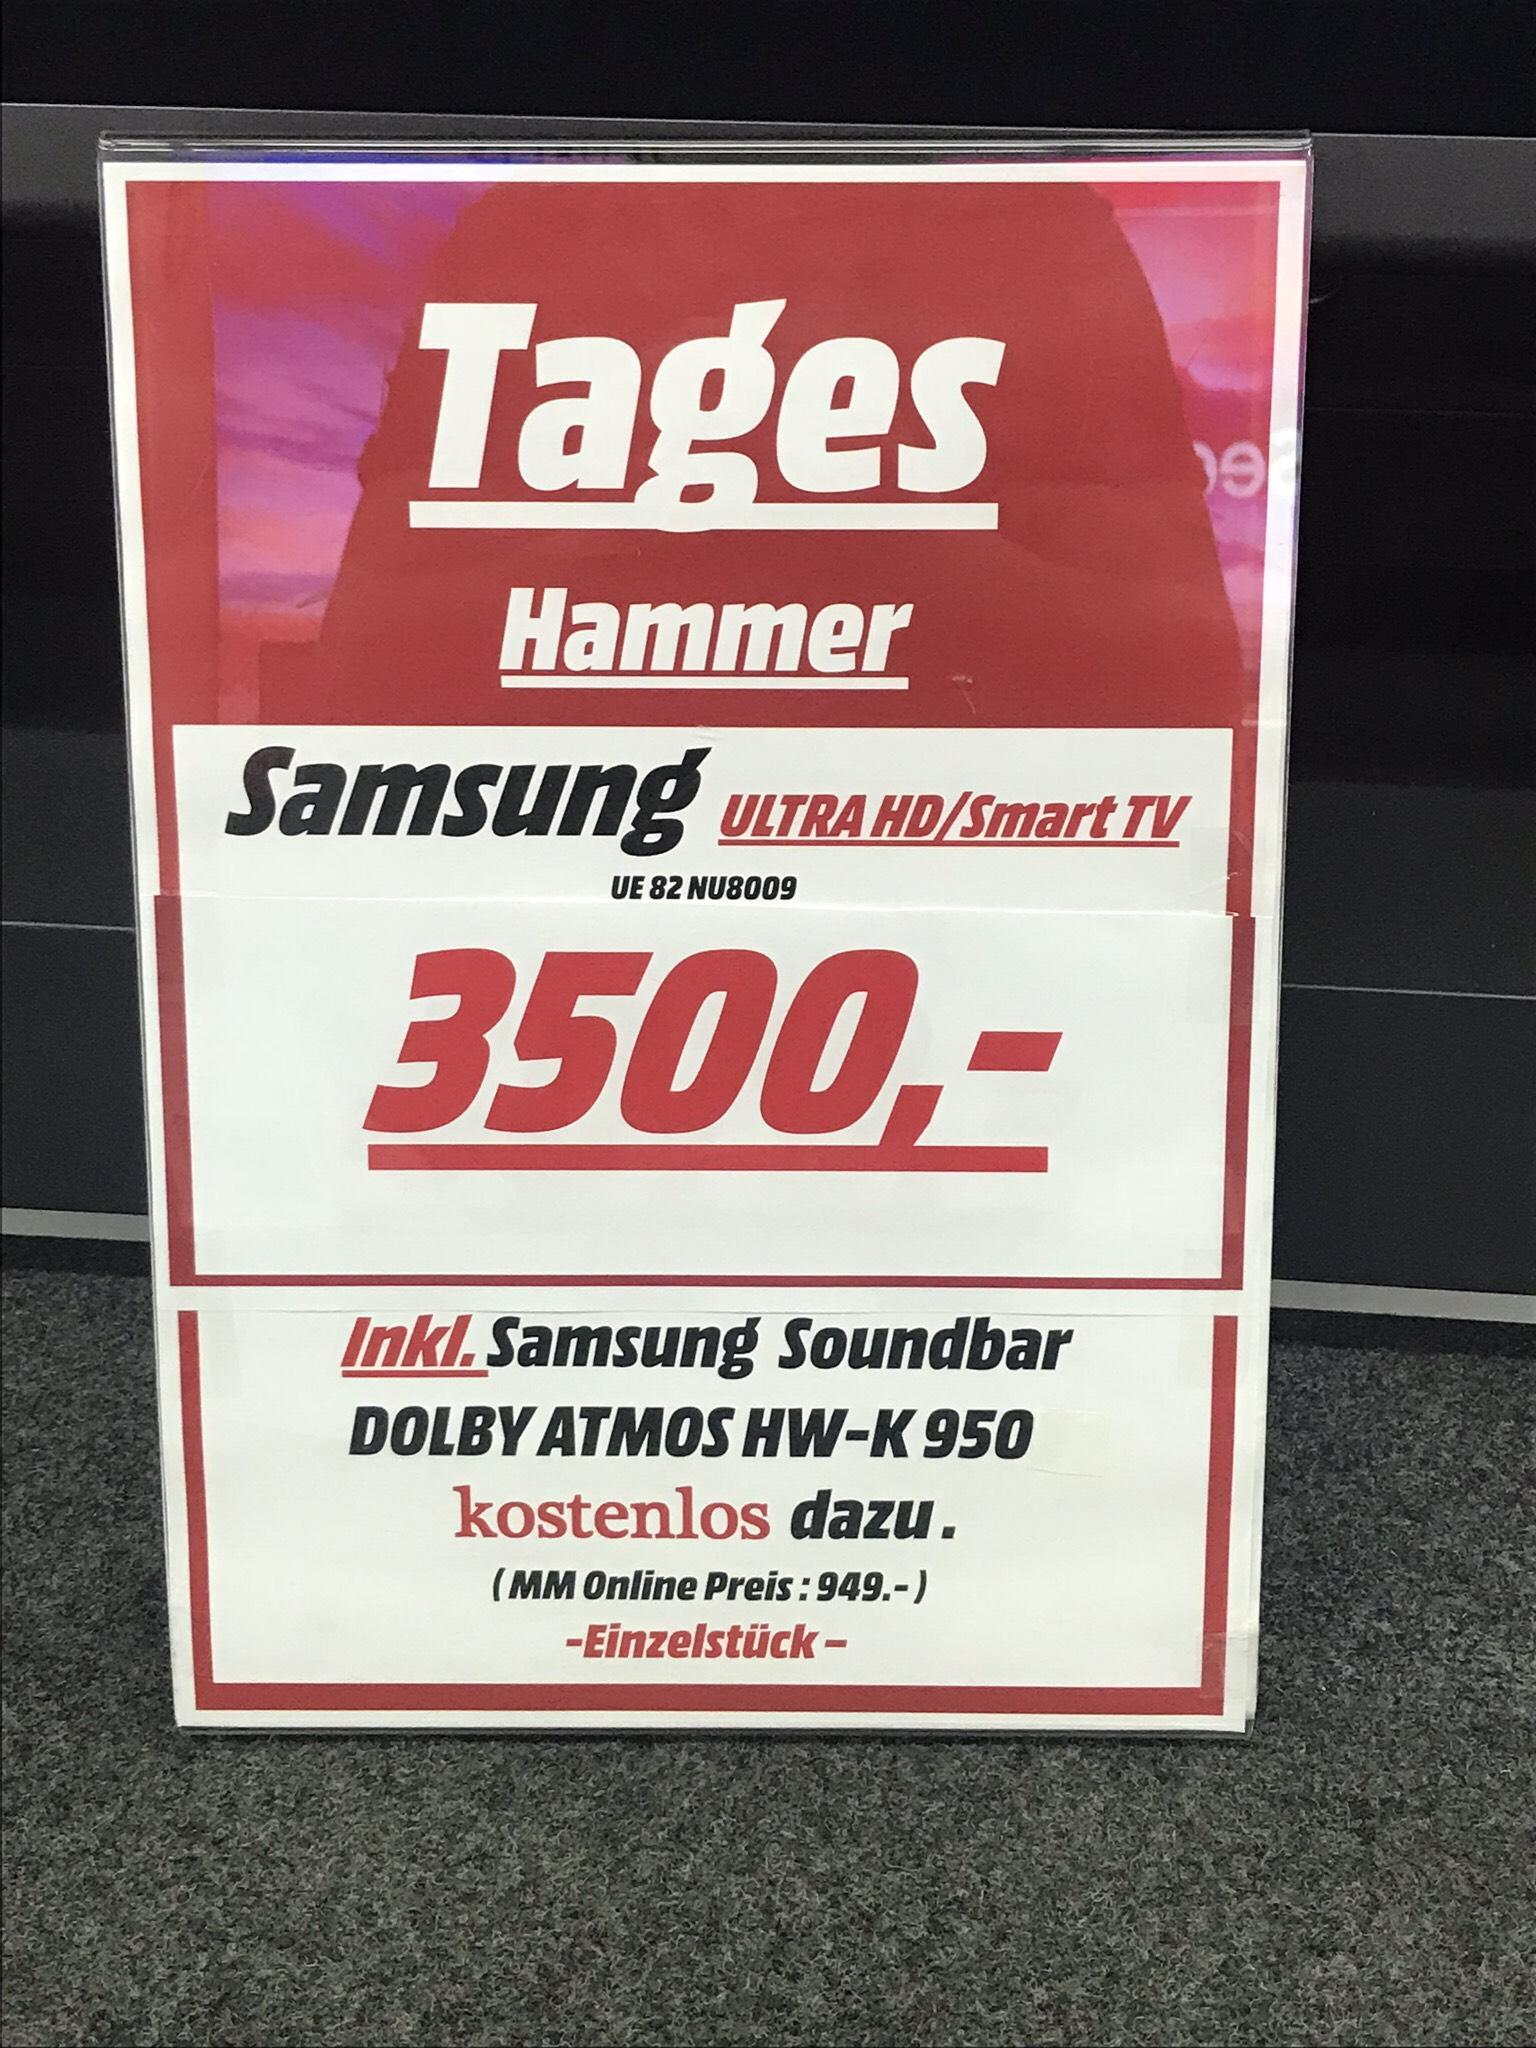 Samsung UE 82 NU 8009 inkl. Samsung HW–K 950 Dolby Atmos Soundbar [LOKAL MEDIA MARKT STUTTGART FEUERBACH]